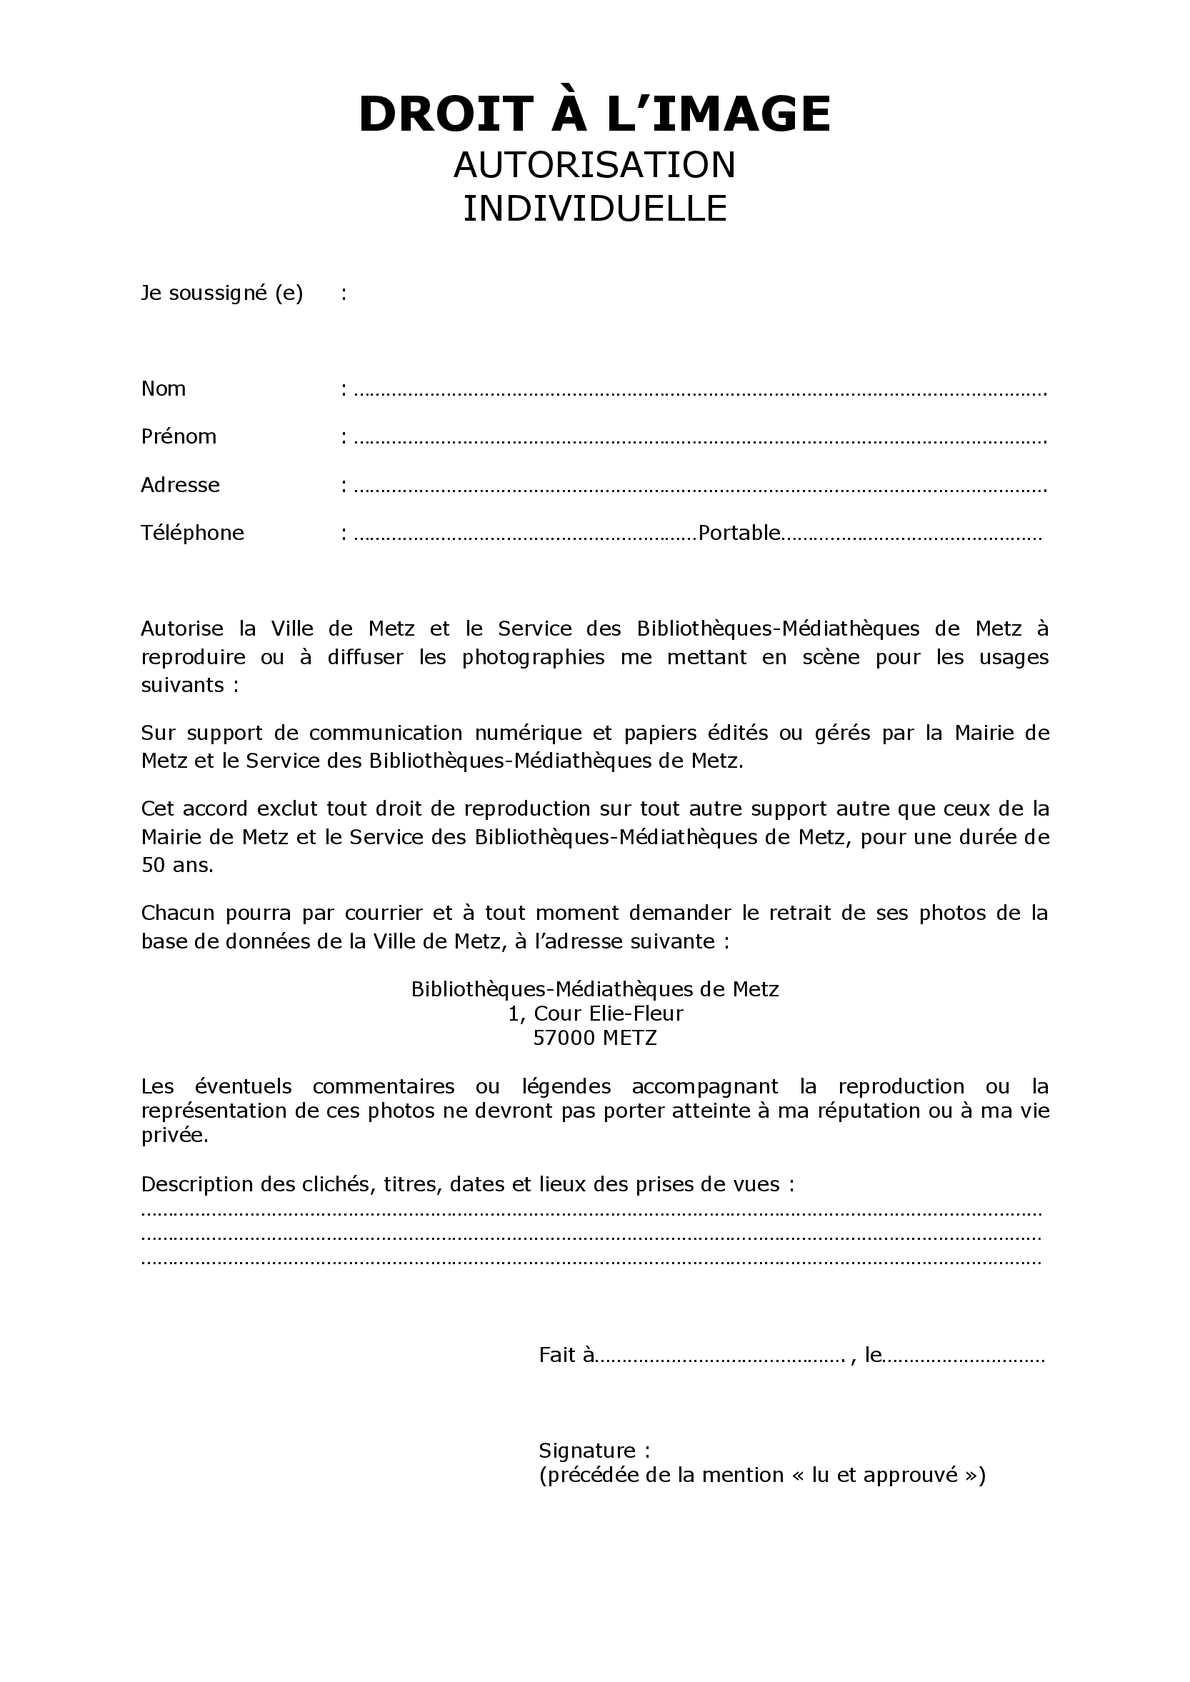 Calameo Autorisation Individuelle